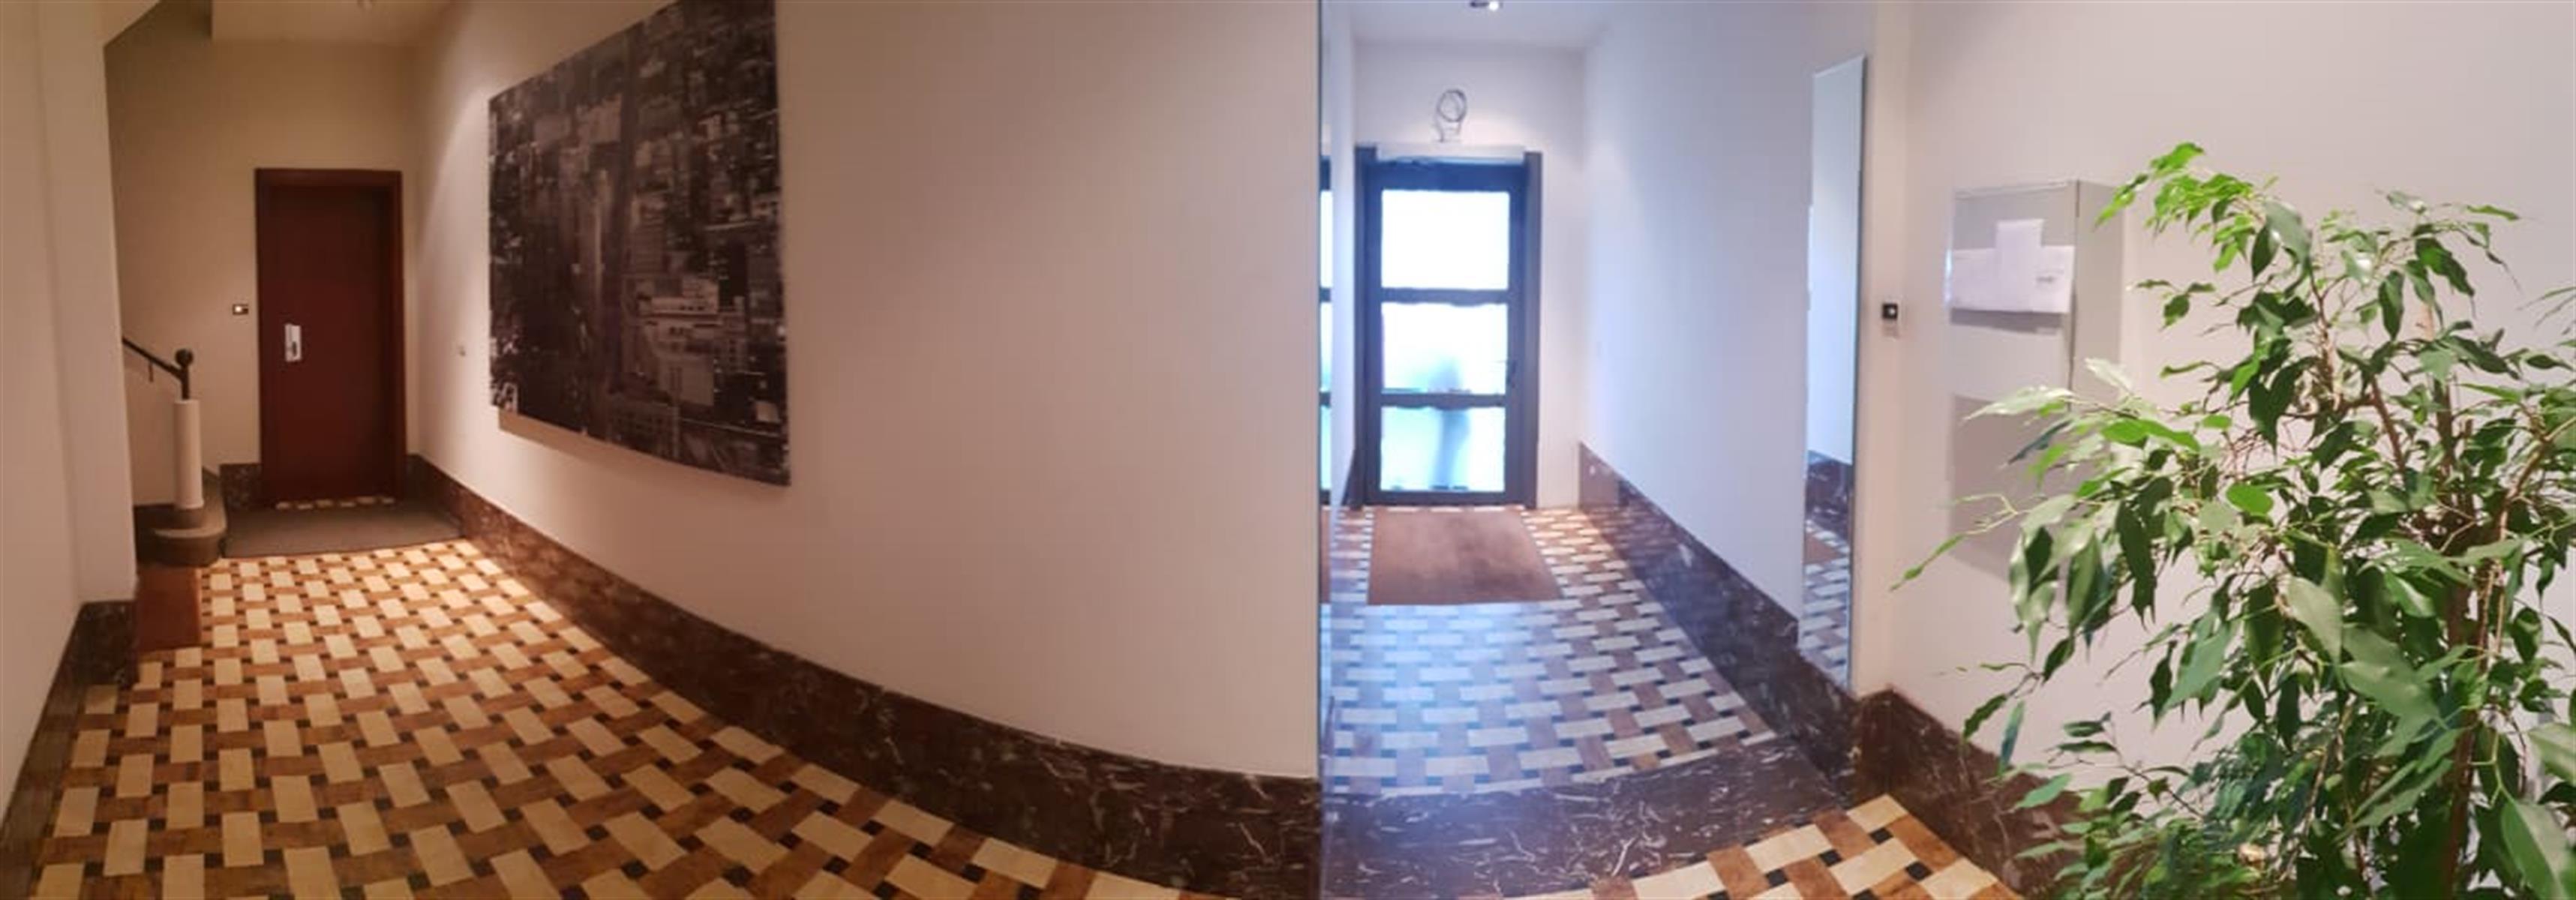 Appartement - Woluwe-Saint-Lambert - #4162898-12